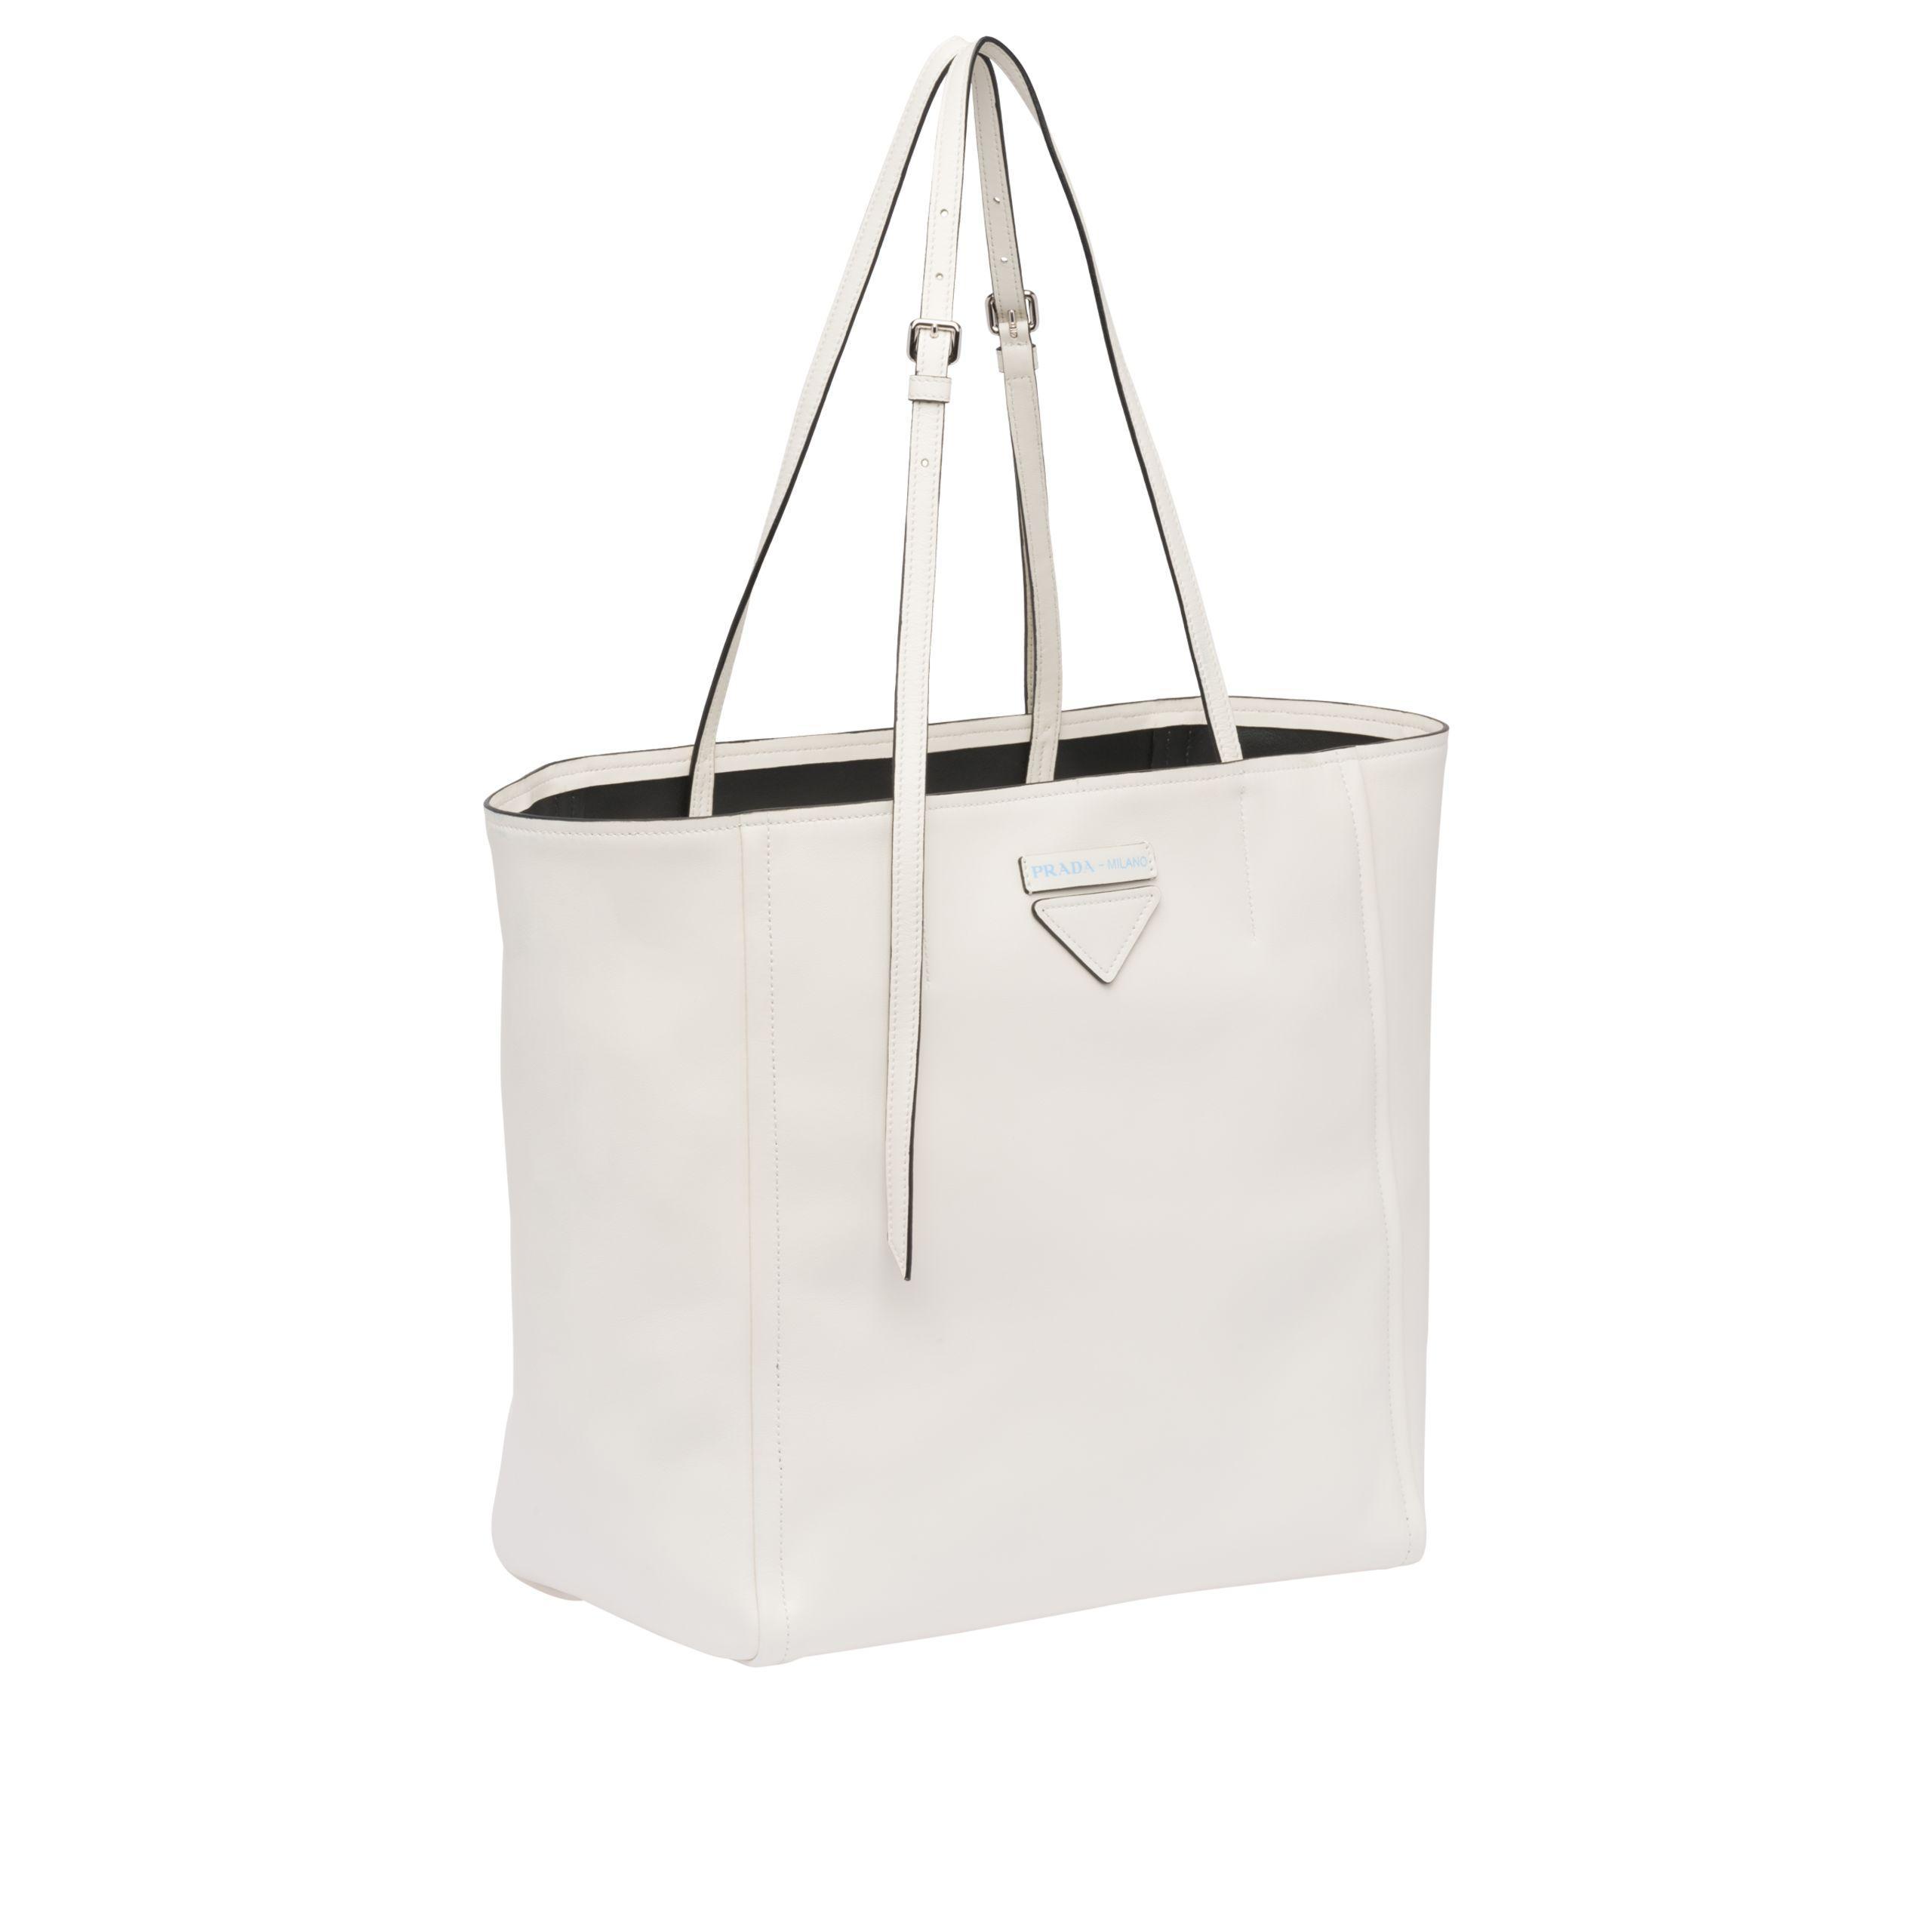 5882774fe6f0af Prada Concept Medium Leather Tote in White - Lyst